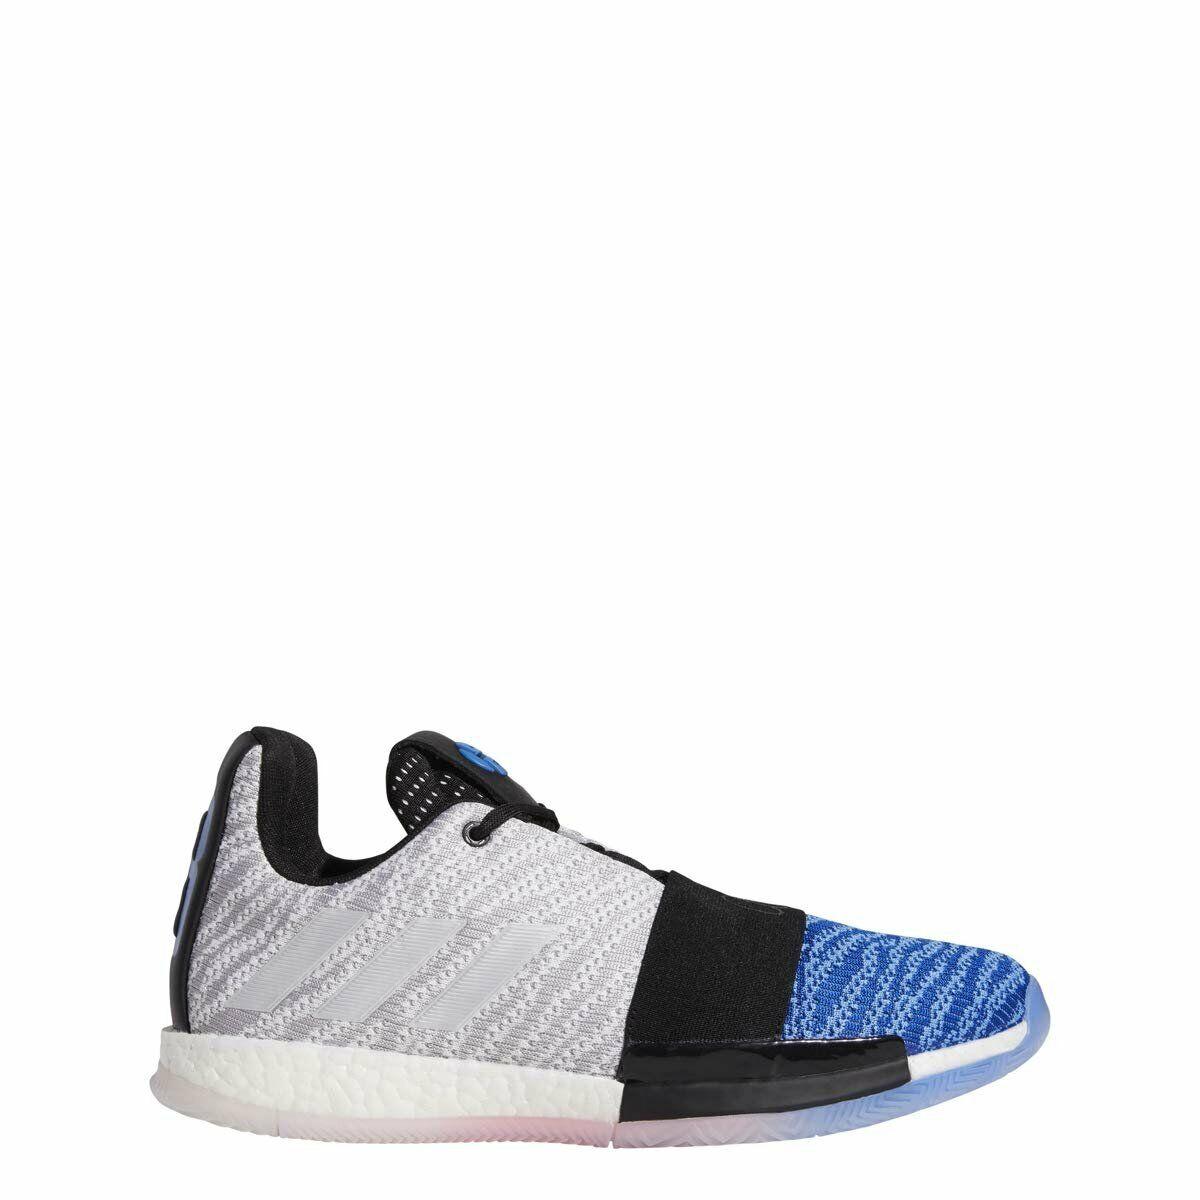 2170e89121f Harden Vol.3 Basketball shoes Adidas Mens nsuknc1236-Athletic Shoes